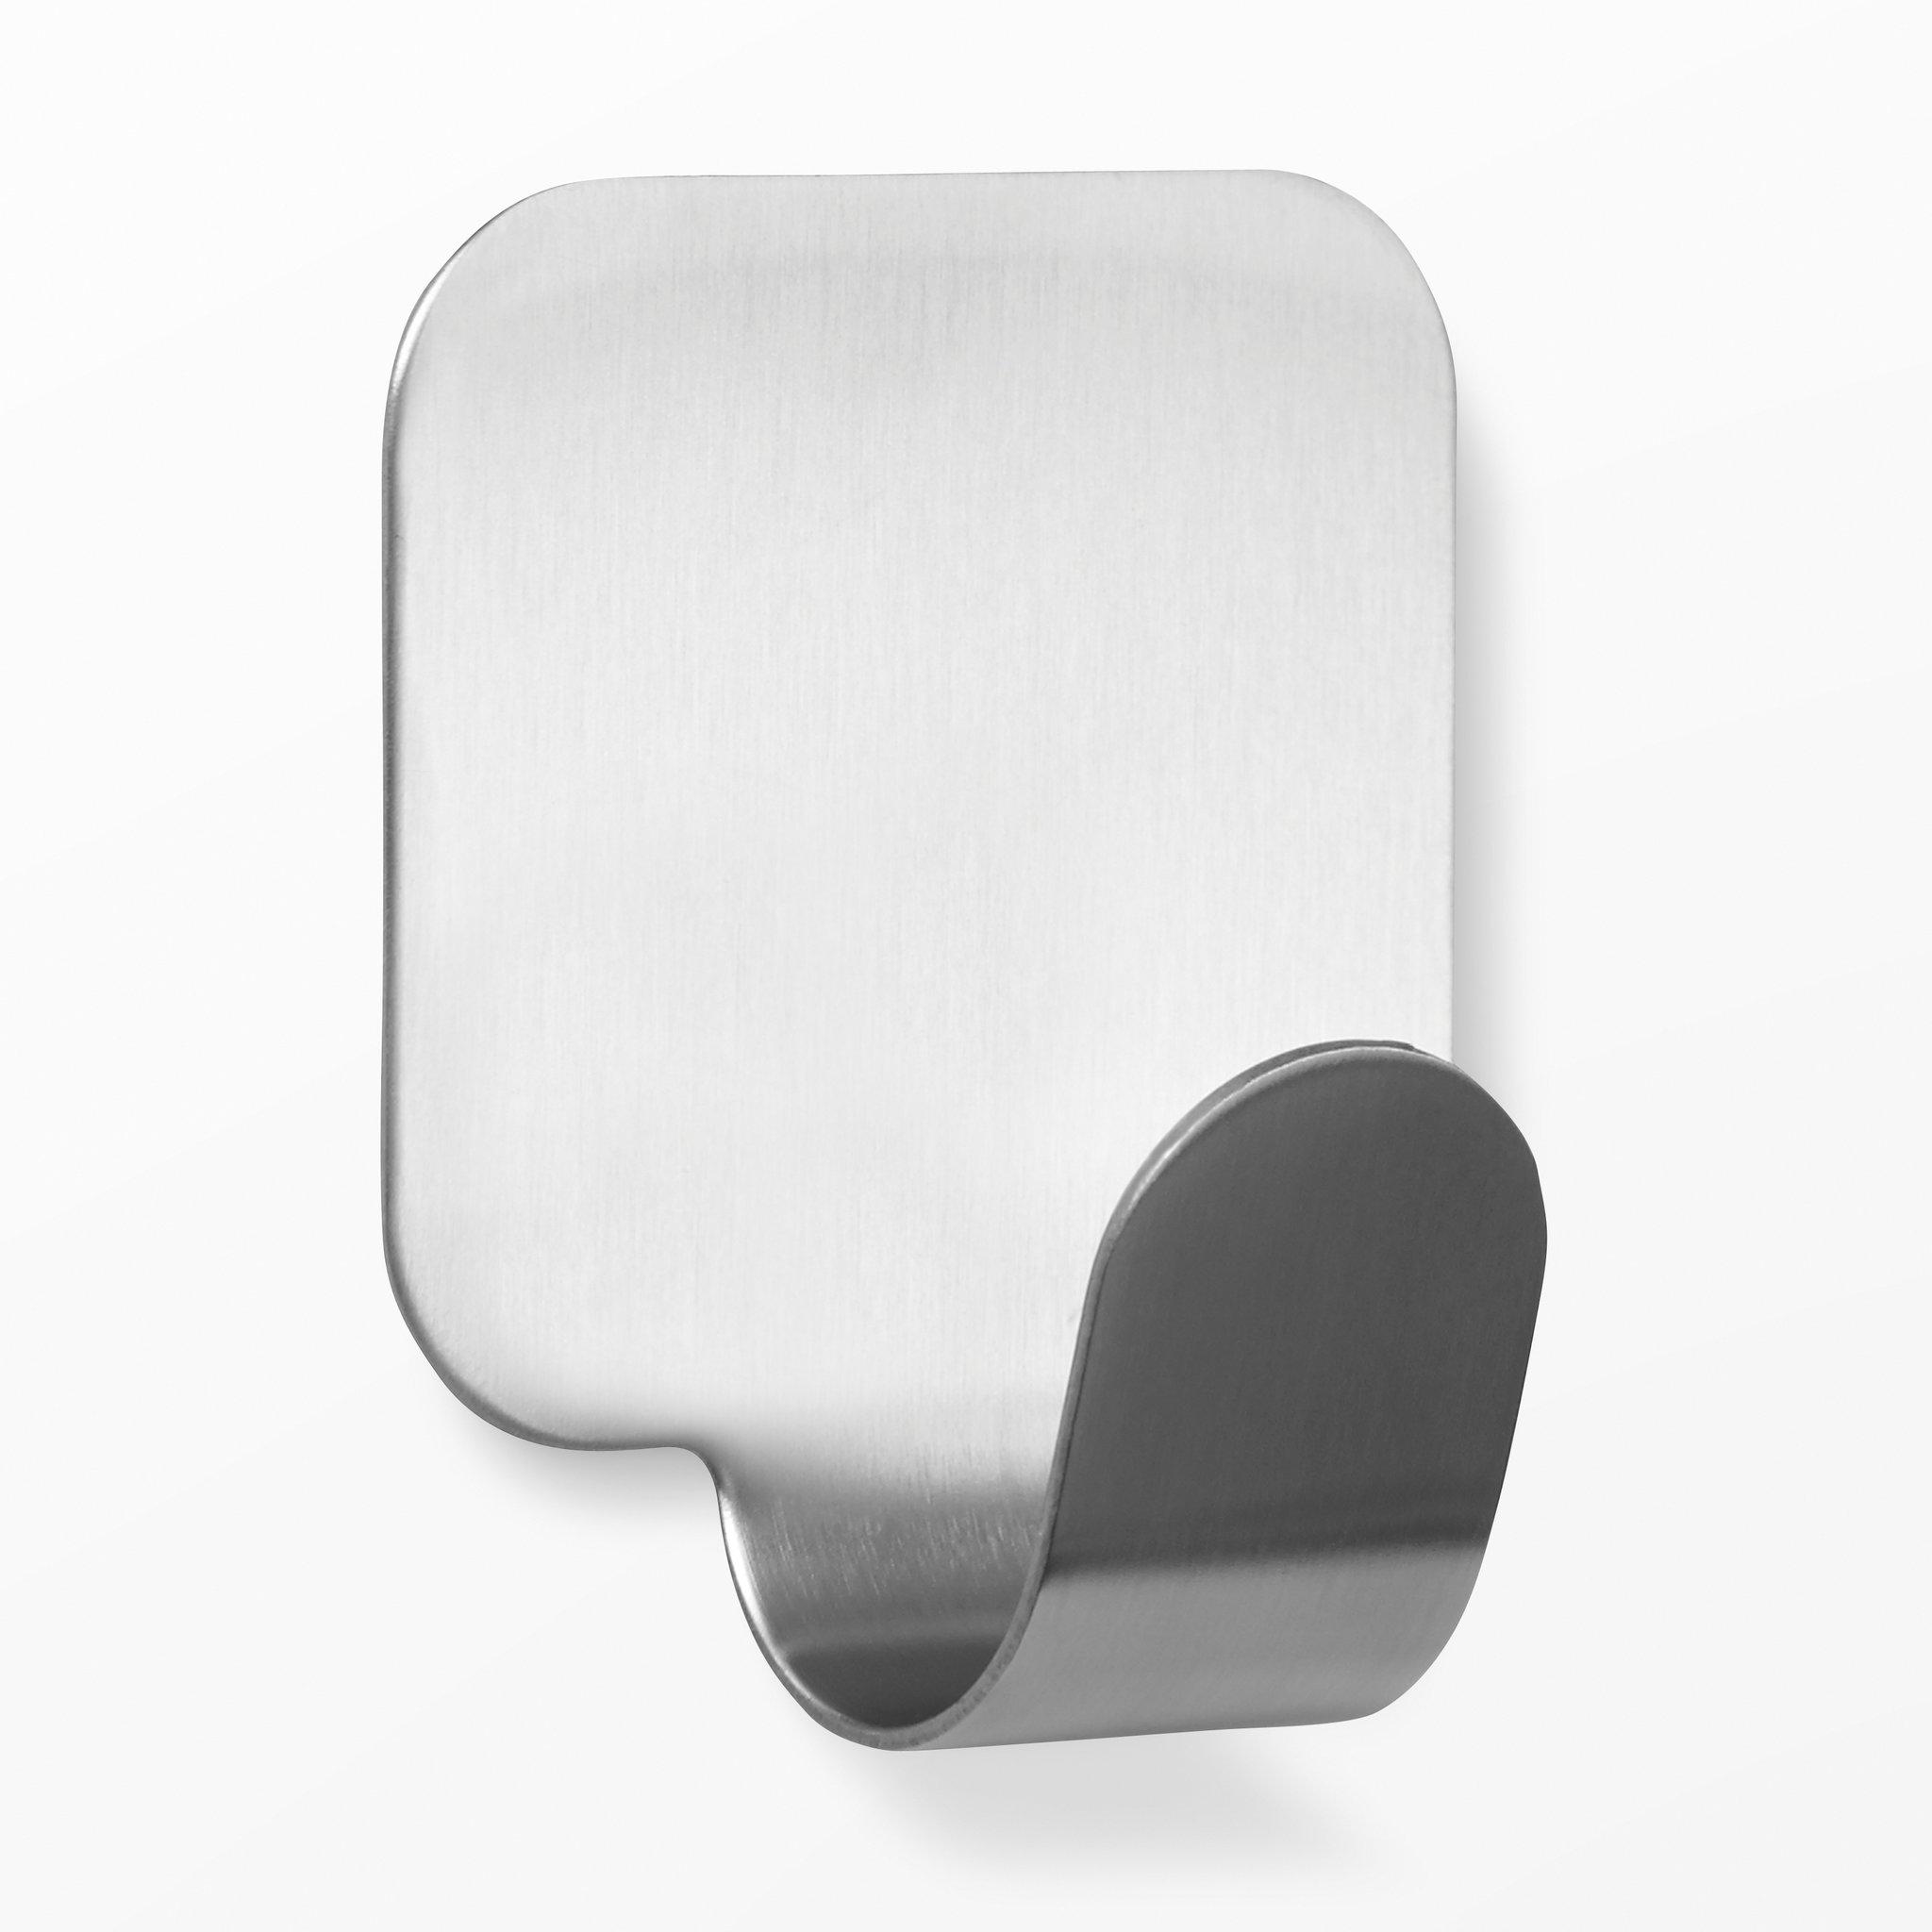 Självhäftande krok Kvarnsjön, 3,7x4,5 cm